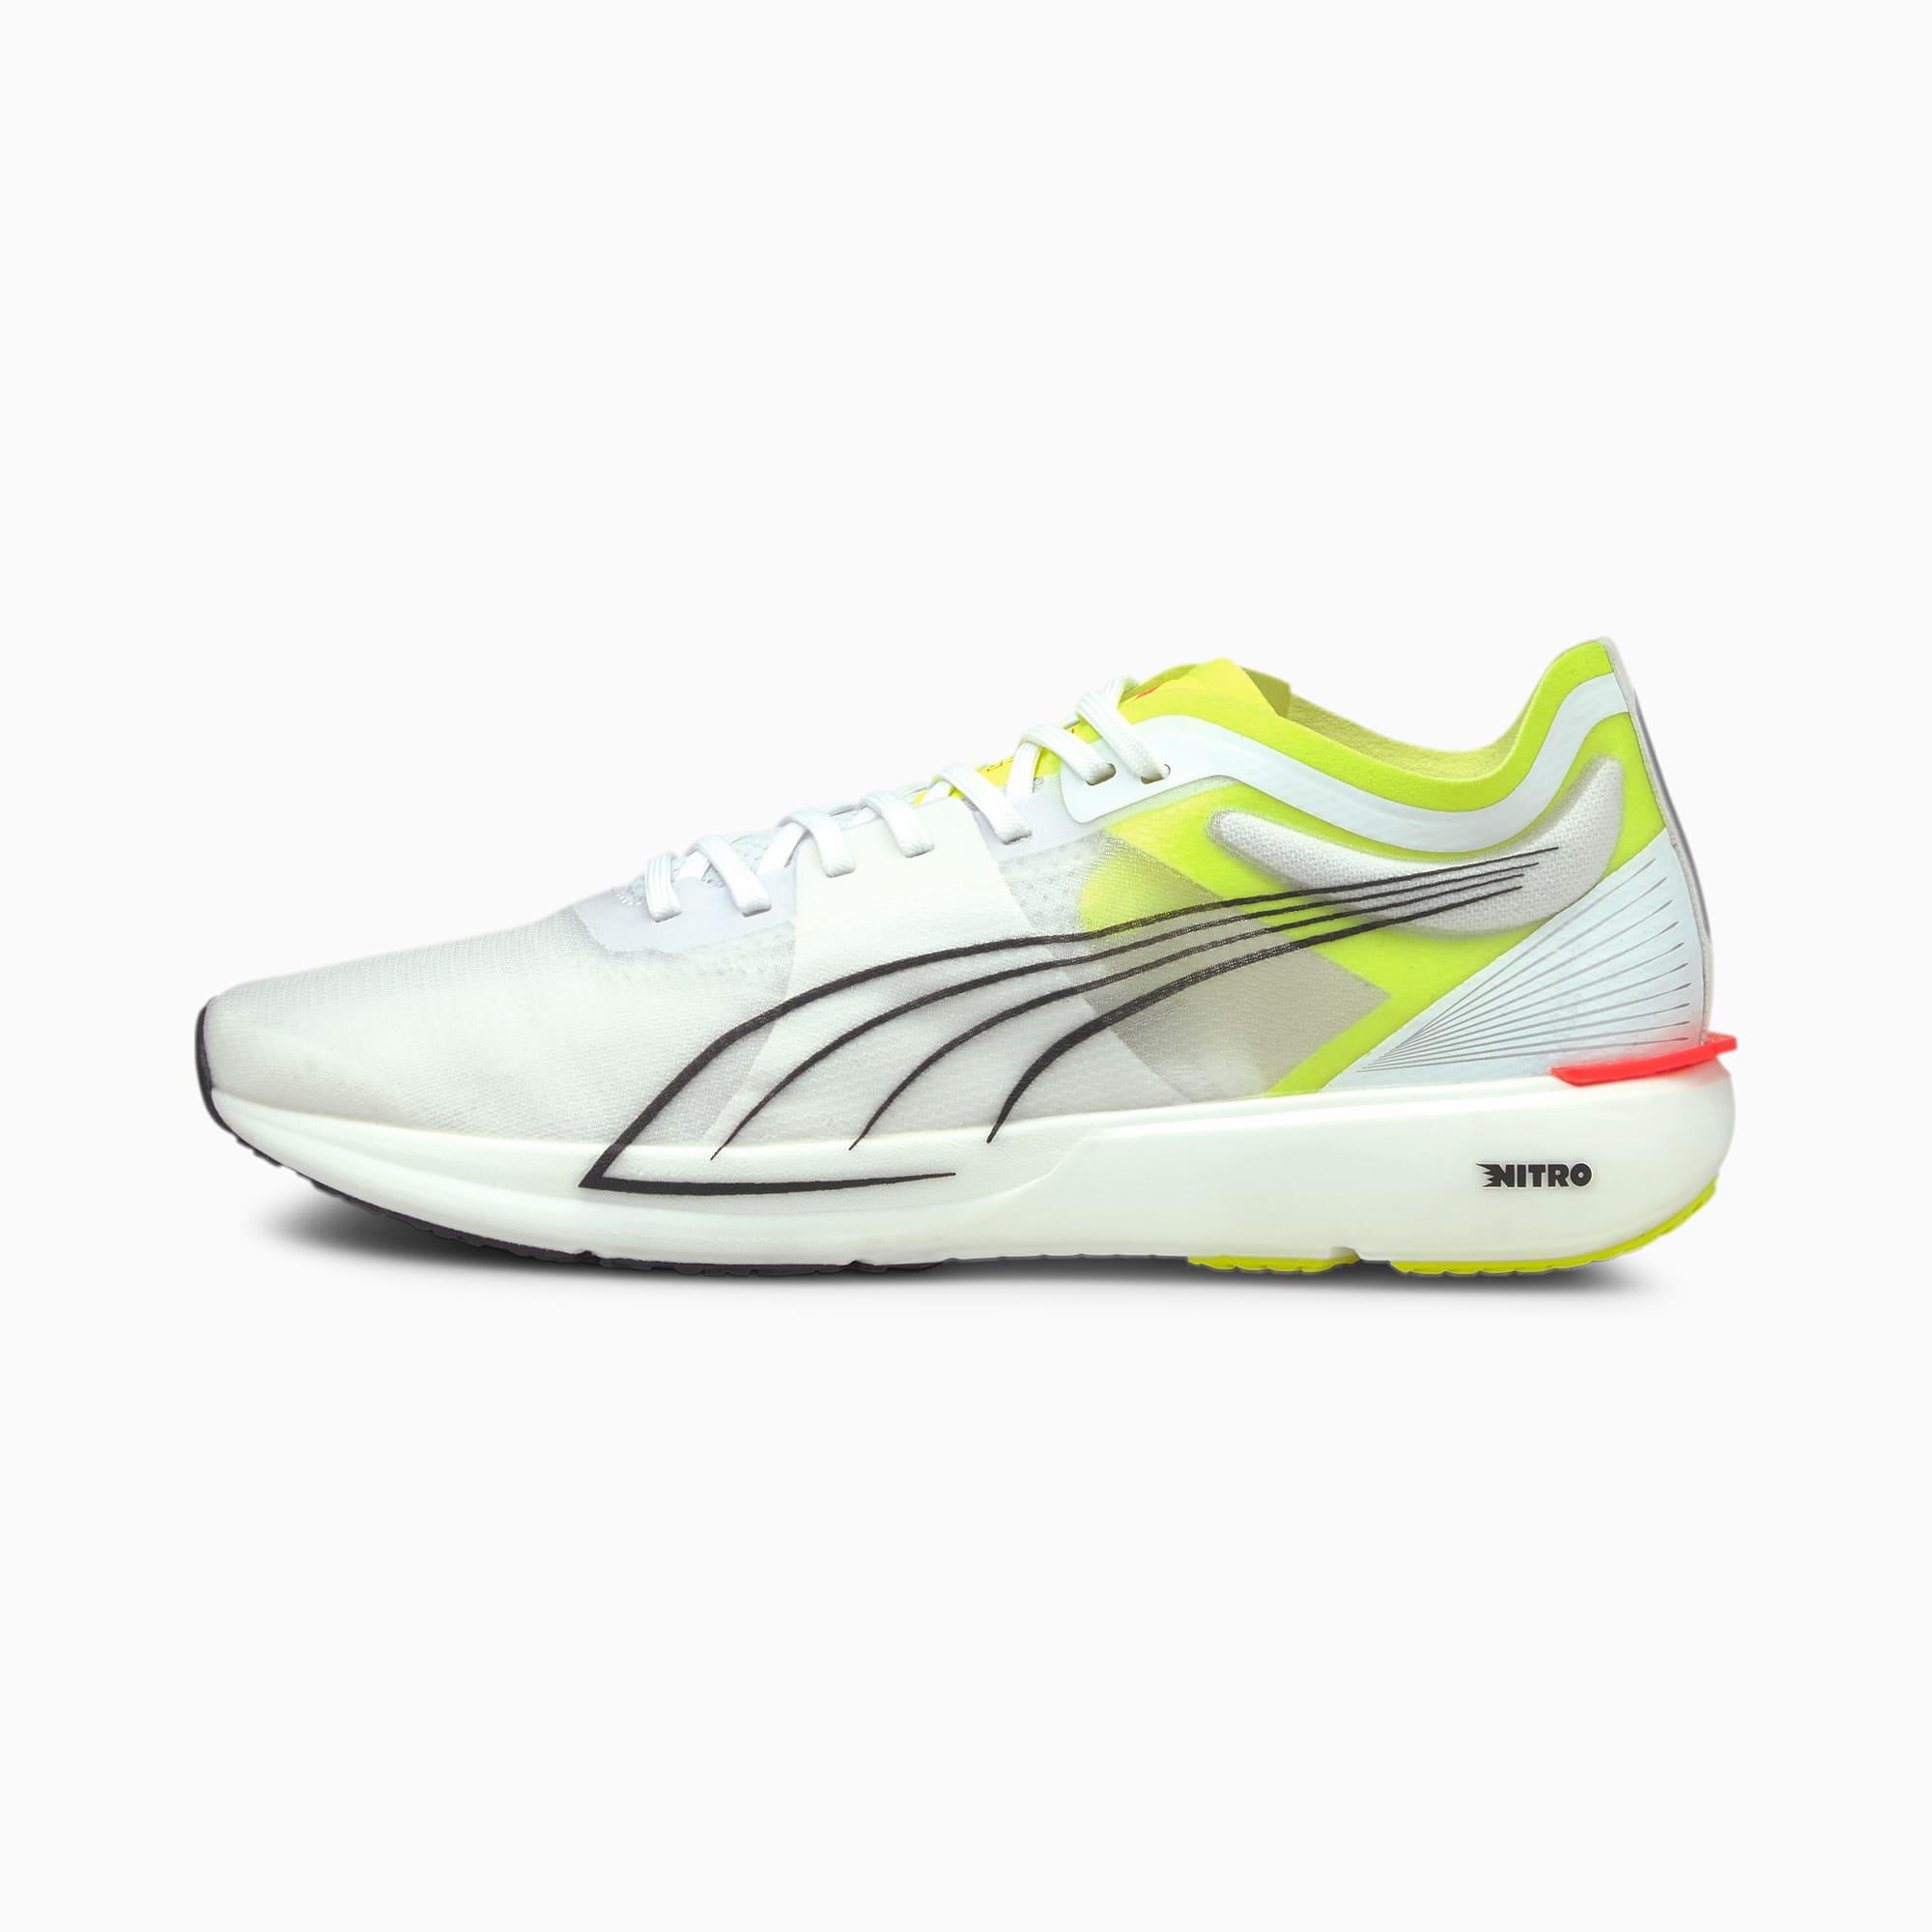 Liberate NITRO Men's Running Shoes